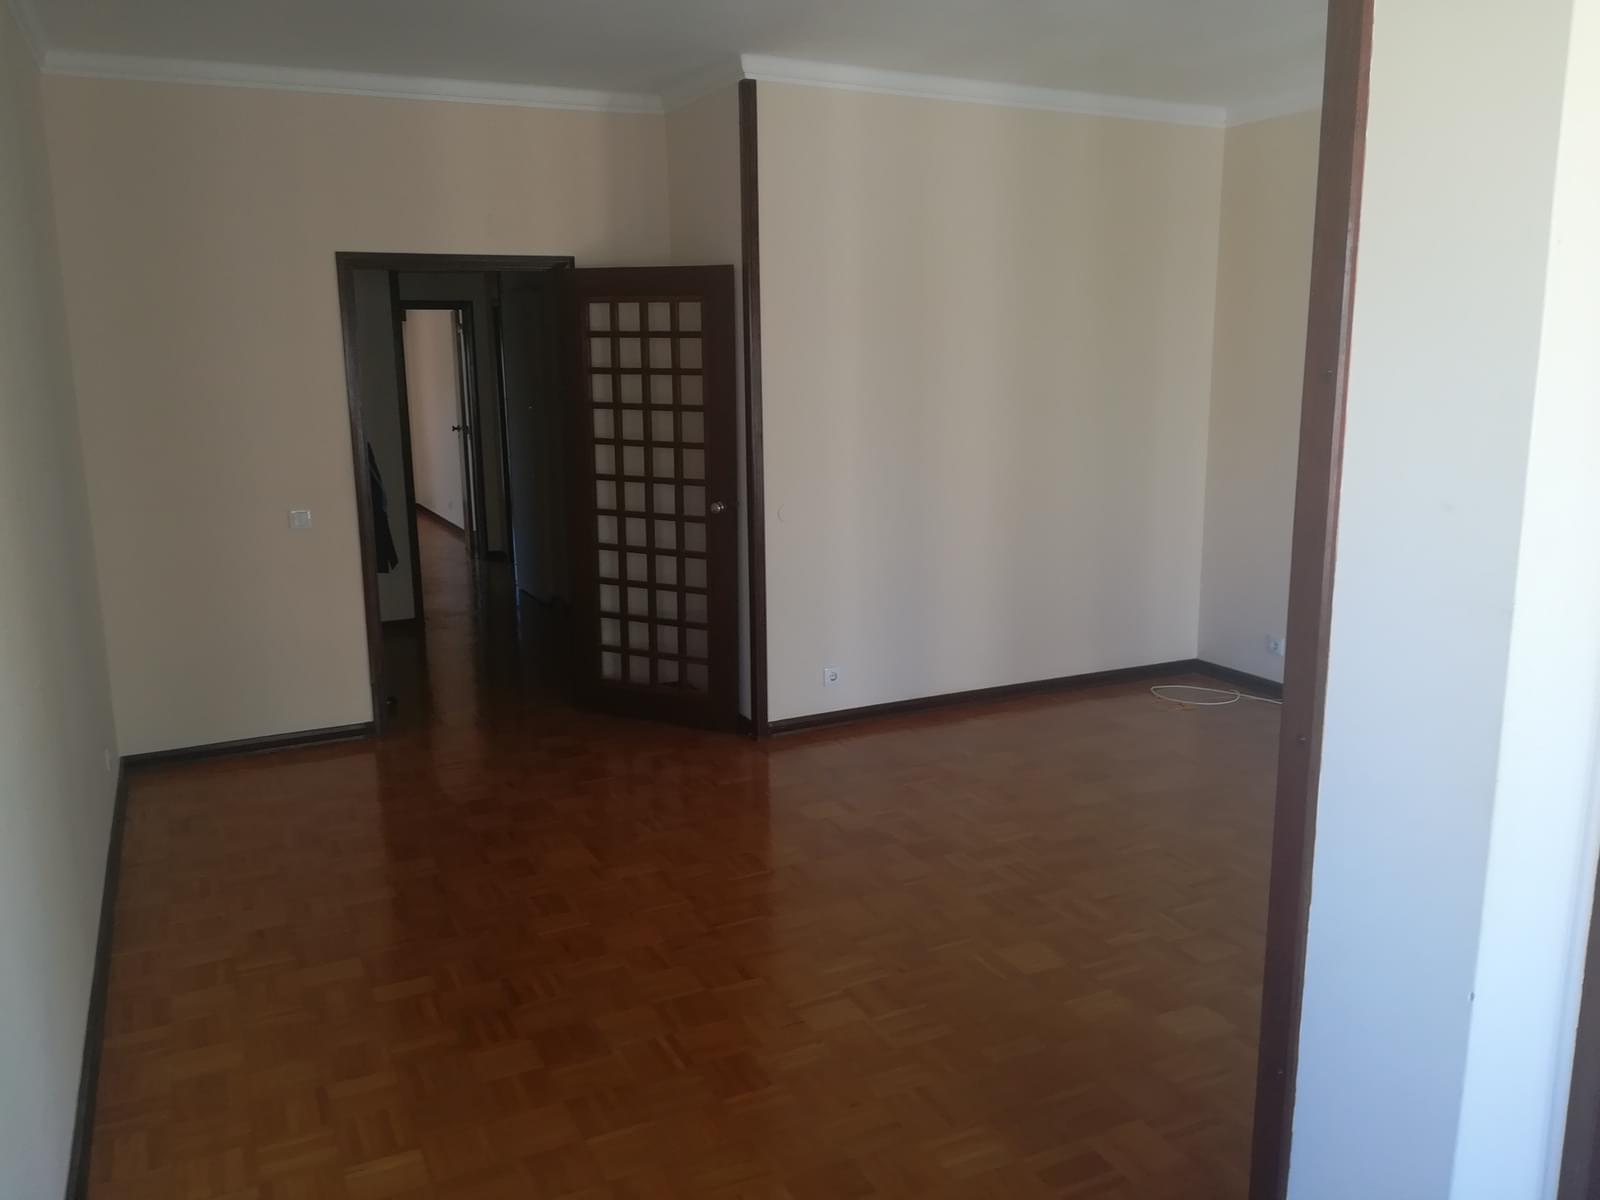 pf17568-apartamento-t3-oeiras-47f80920-0696-4535-ae1f-760fee228c69